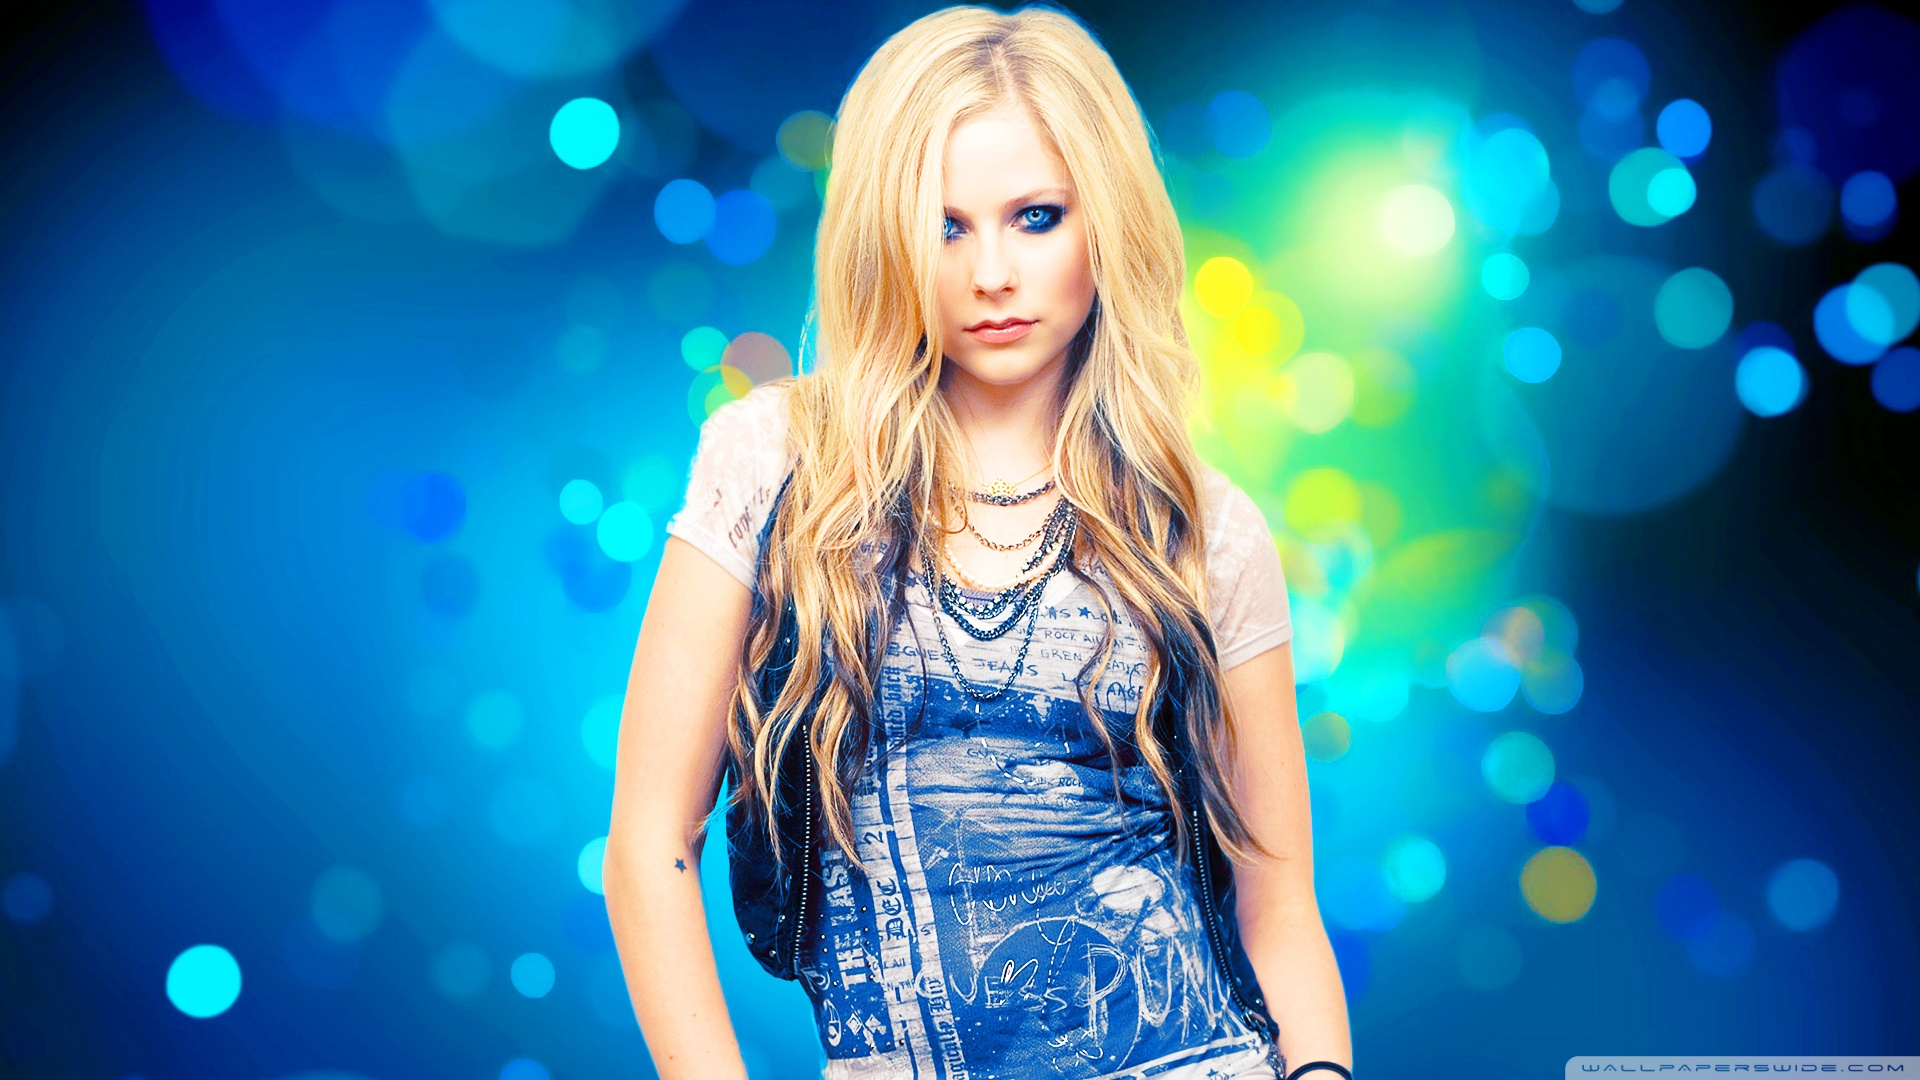 Avril Lavigne 1 Wallpapers: Avril Lavigne Wallpaper 1920x1080